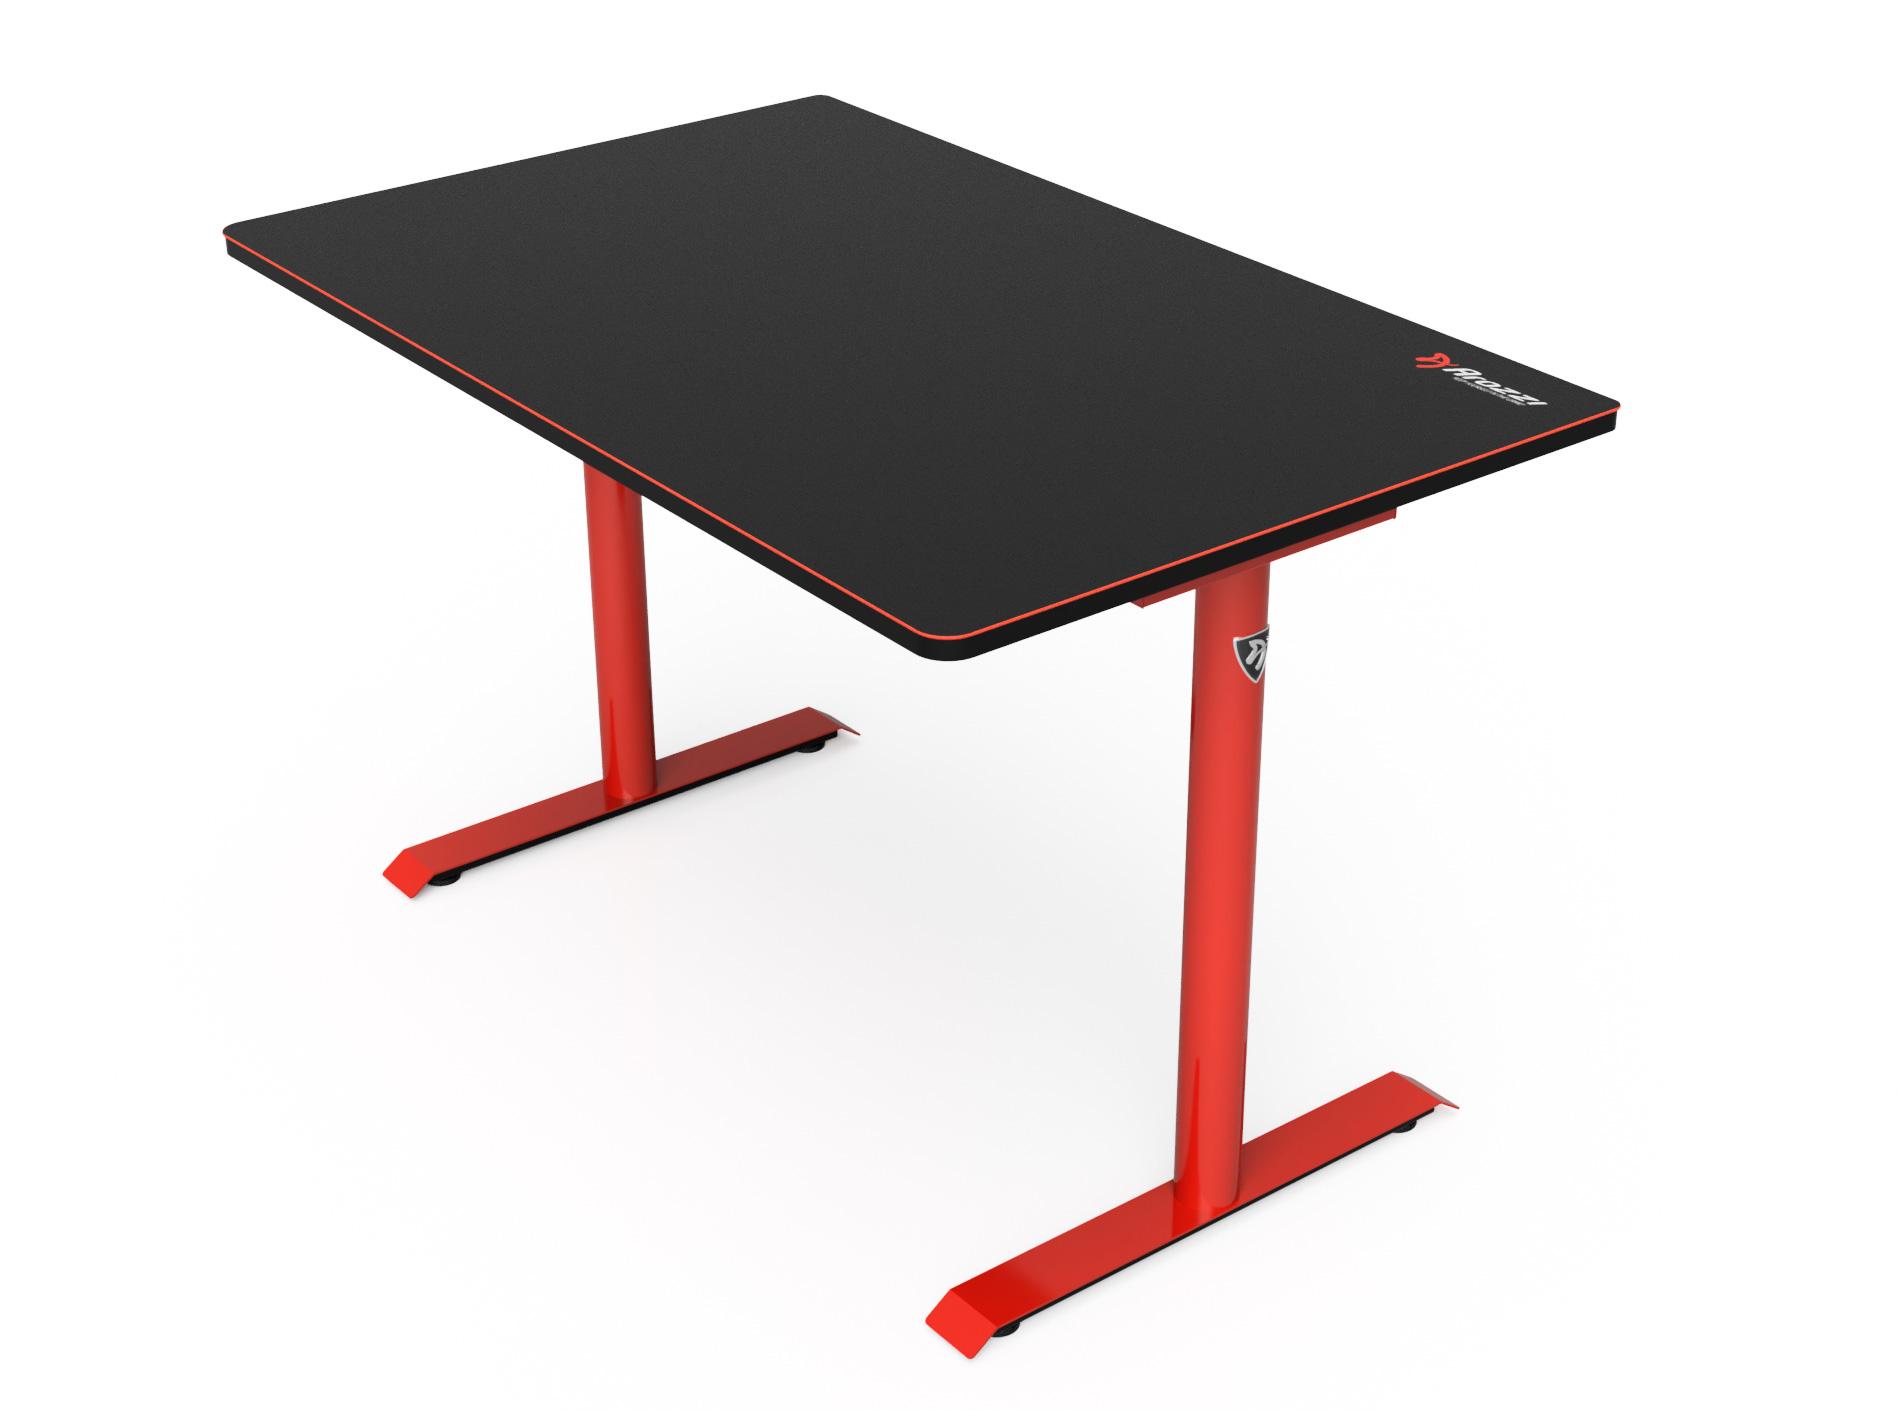 Arozzi Arena Leggero - Gerade - Rechteckige Form - MDF-Platten - Stahl - Mikrofaser - Rot